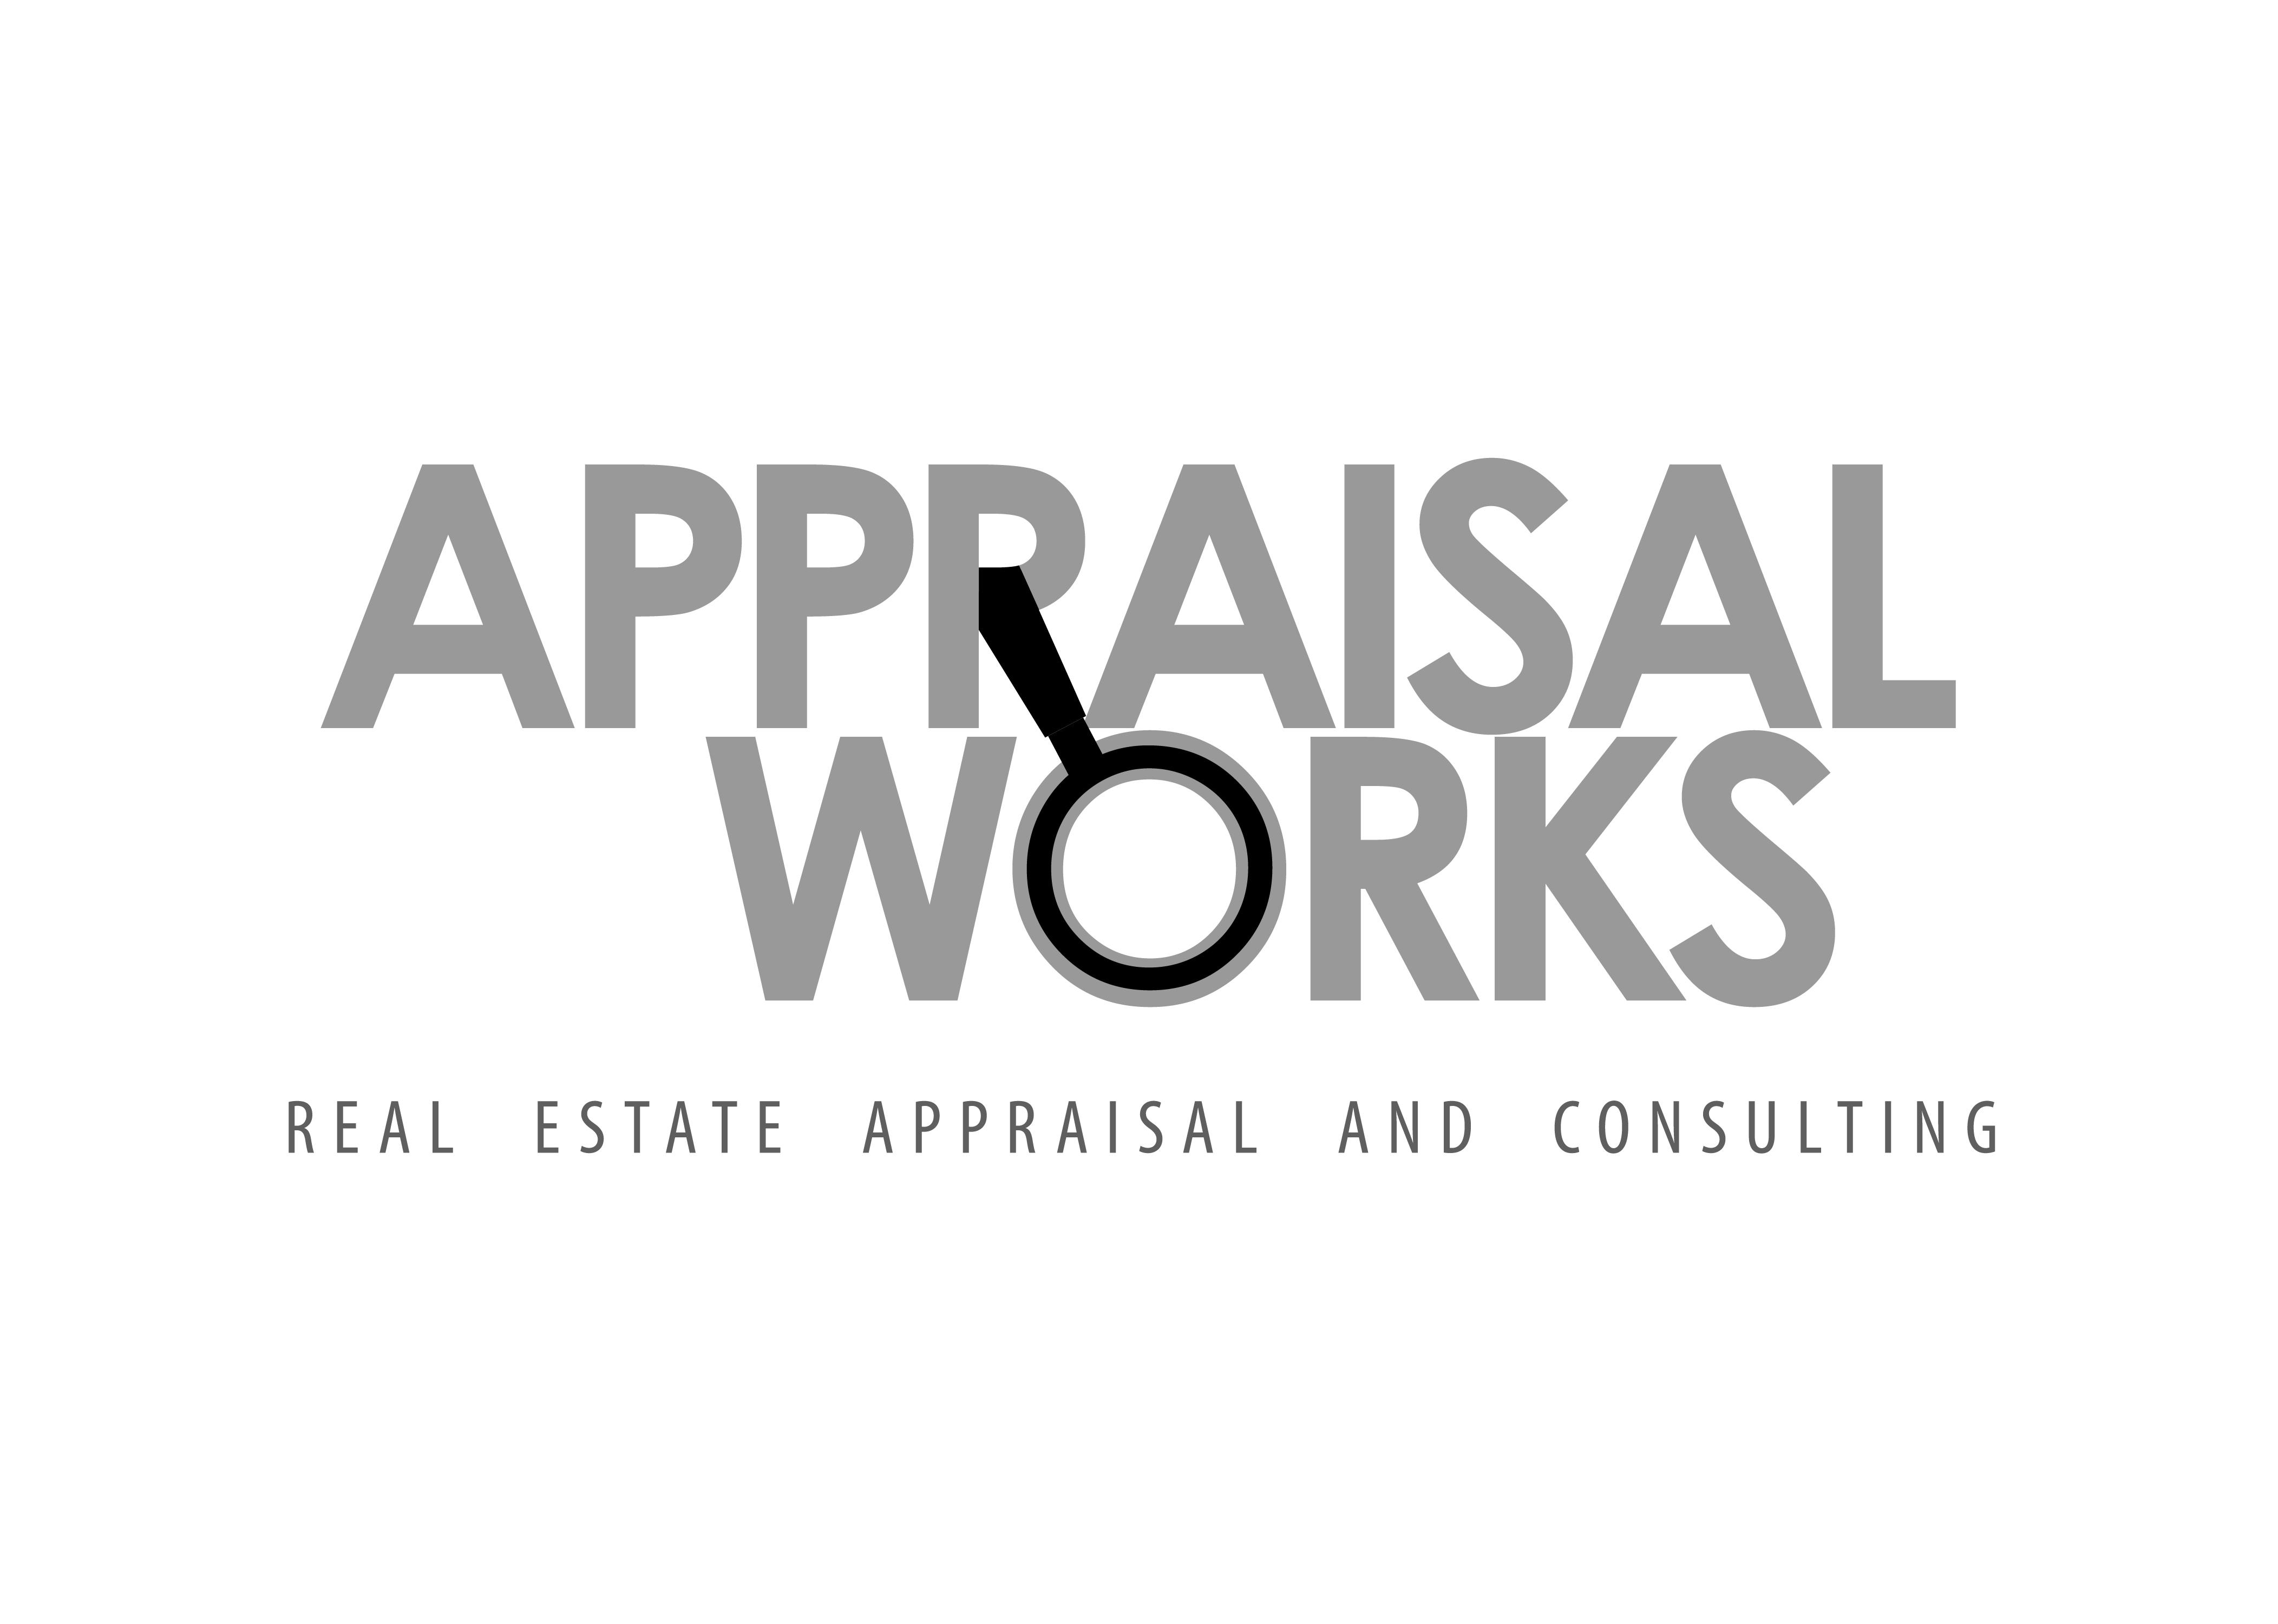 Logo Design by Niko Bolado - Entry No. 189 in the Logo Design Contest Appraisal Works Logo Design.